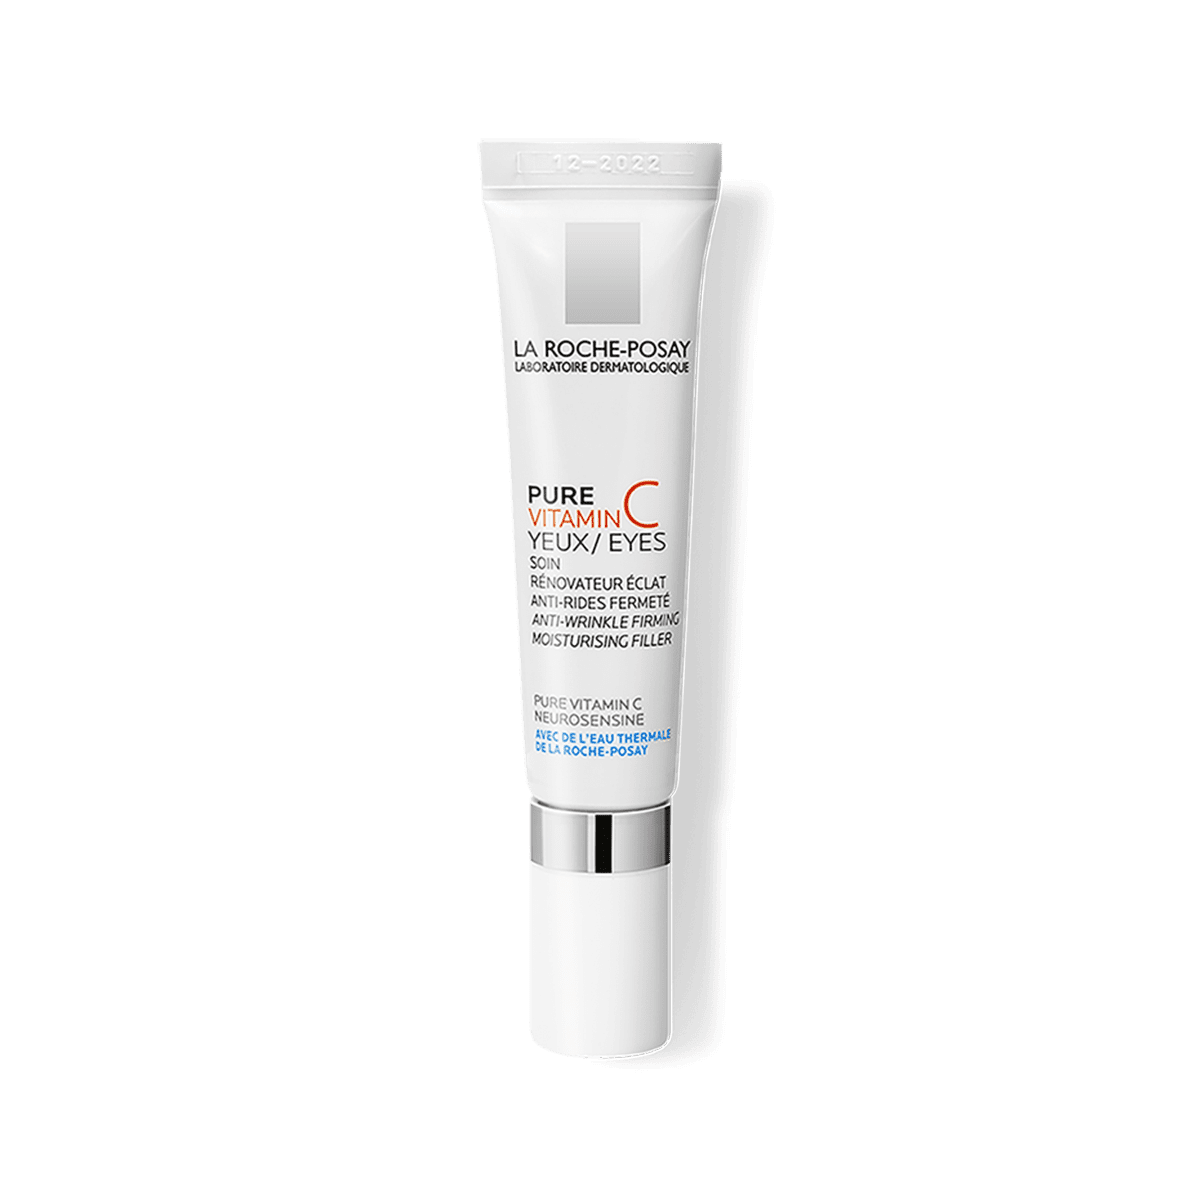 Pure Vitamin C10 Serum